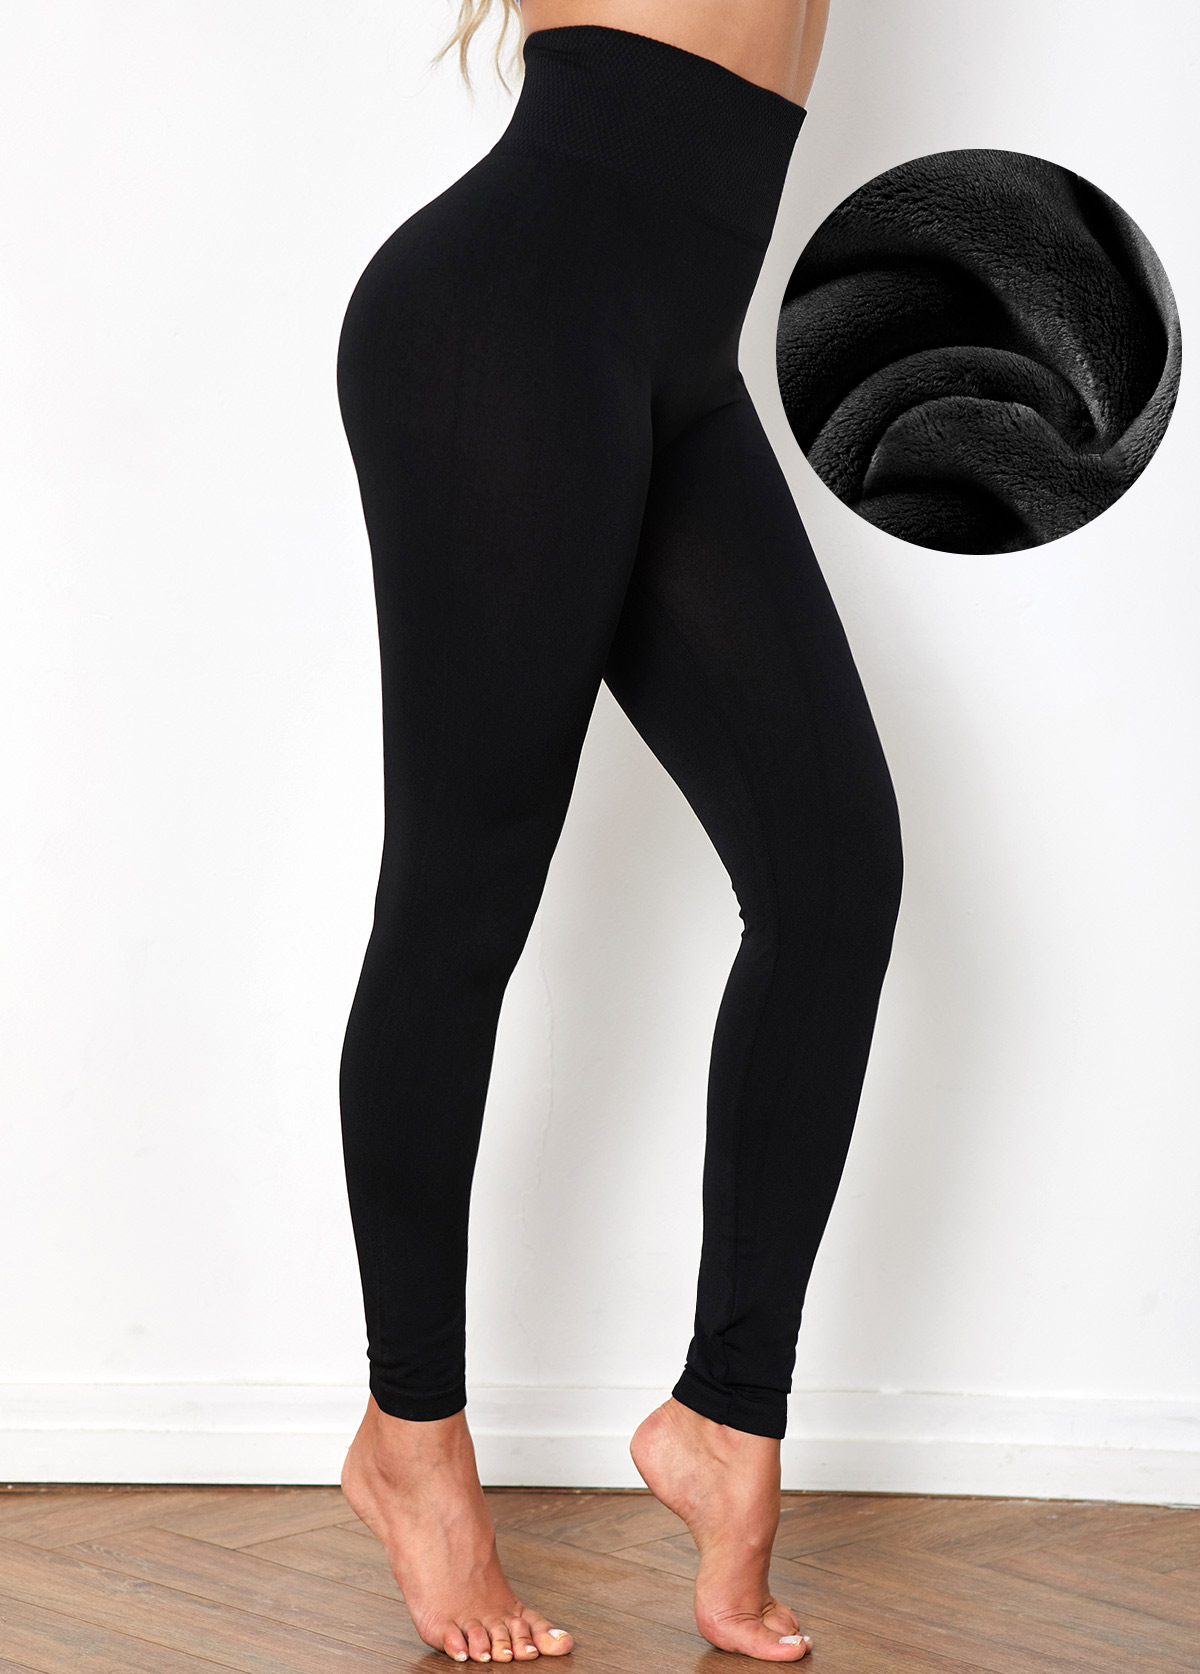 Plush High Waist Super Elastic Legging Pants